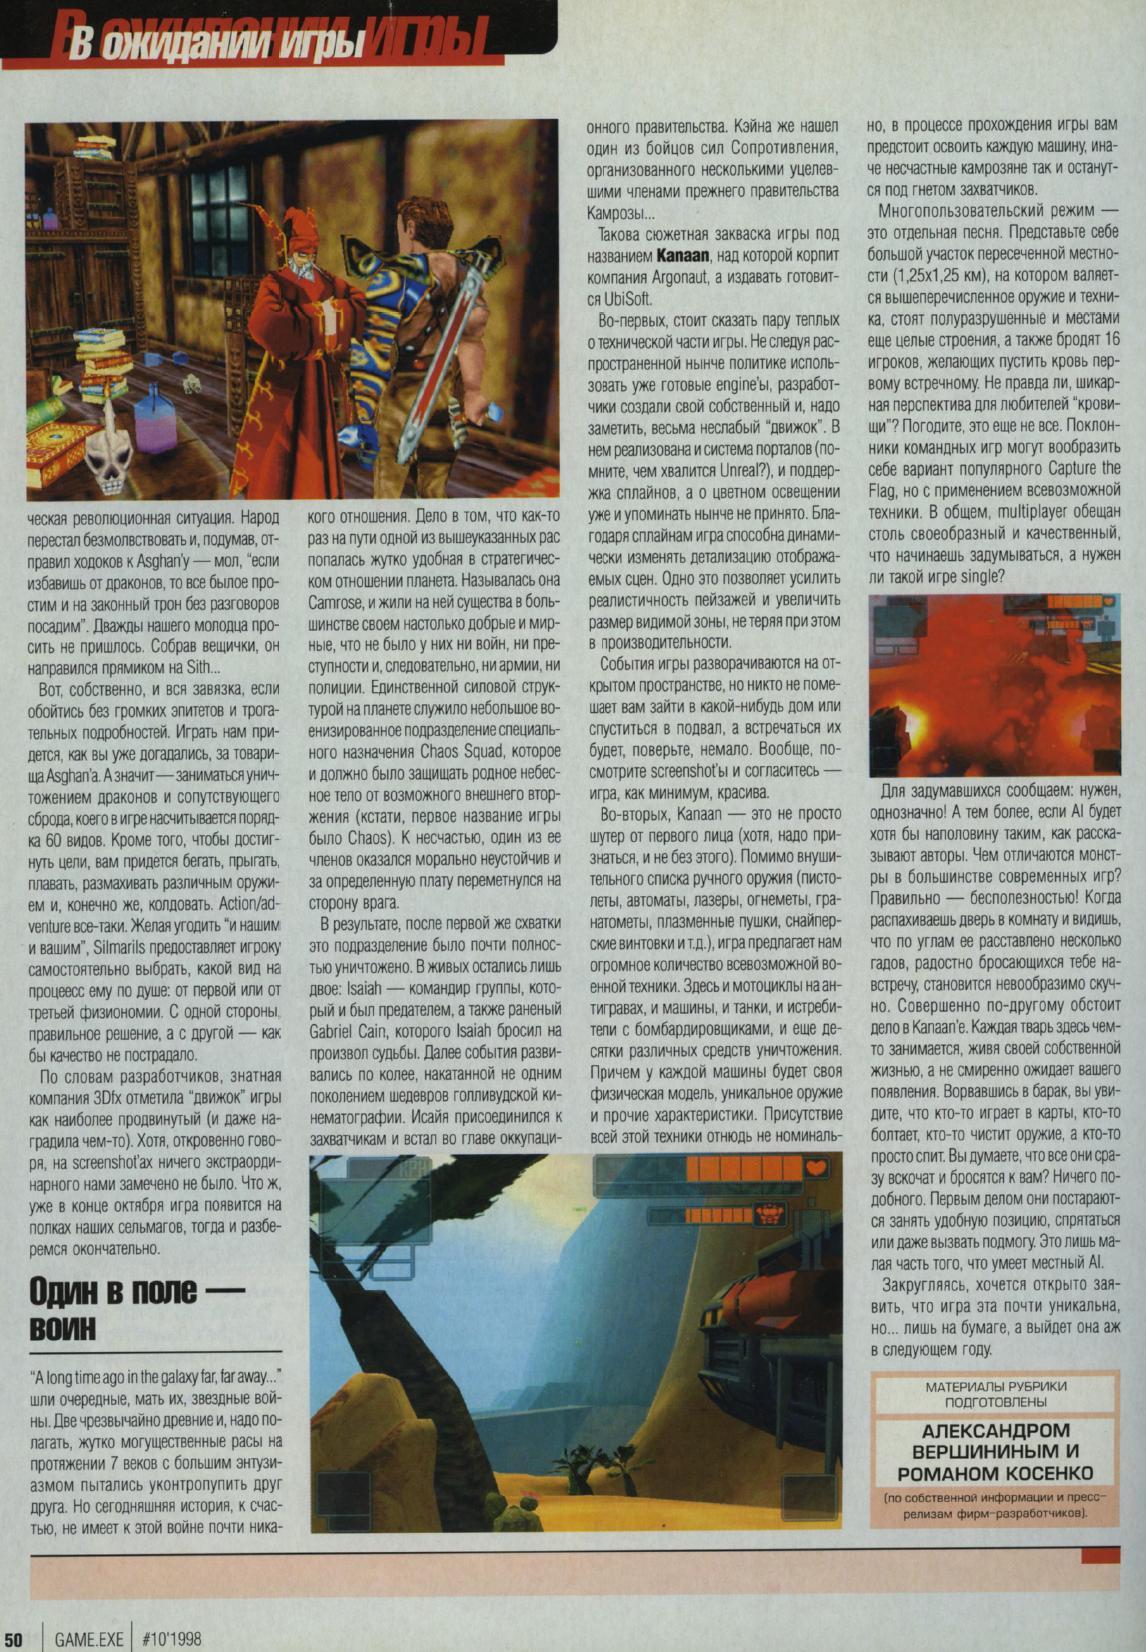 Game EXE 10 1998.JPG